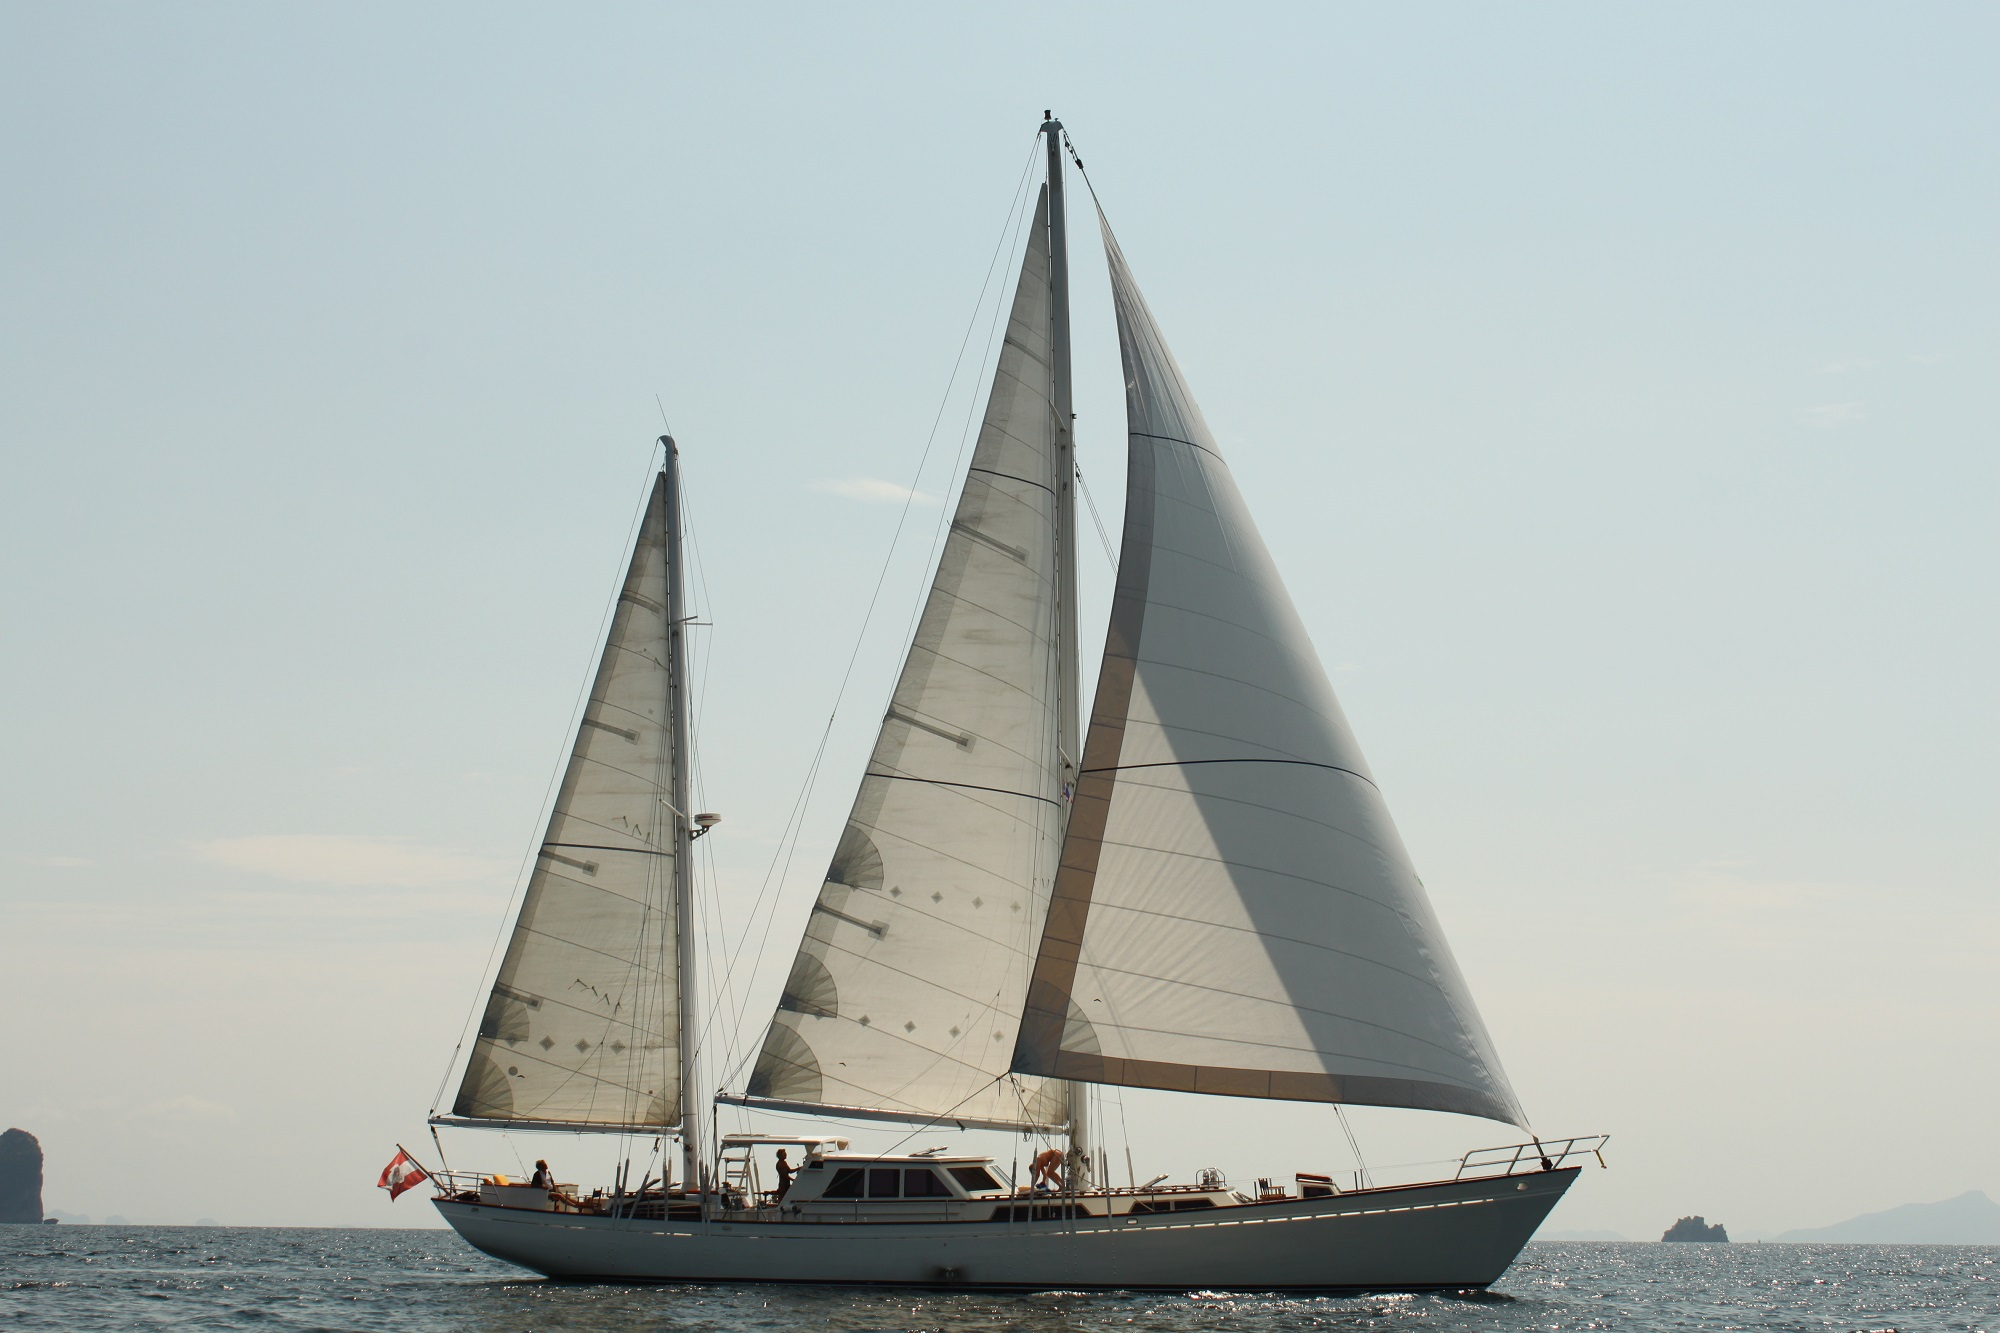 BB_MetaIV_under full sails3.JPG